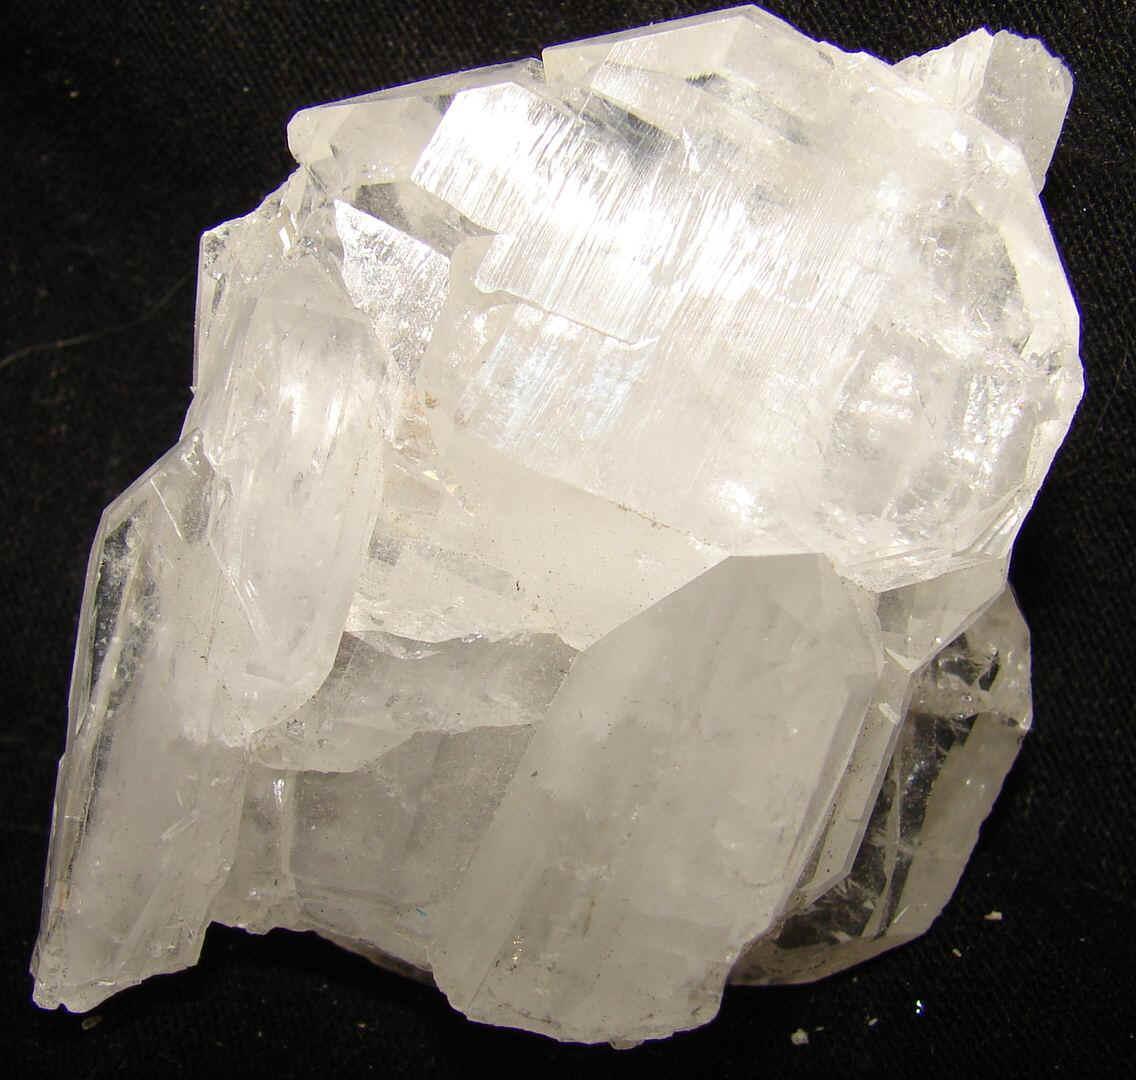 http://www.quartzcrystals.net/icexl-54.jpg (582341 bytes)